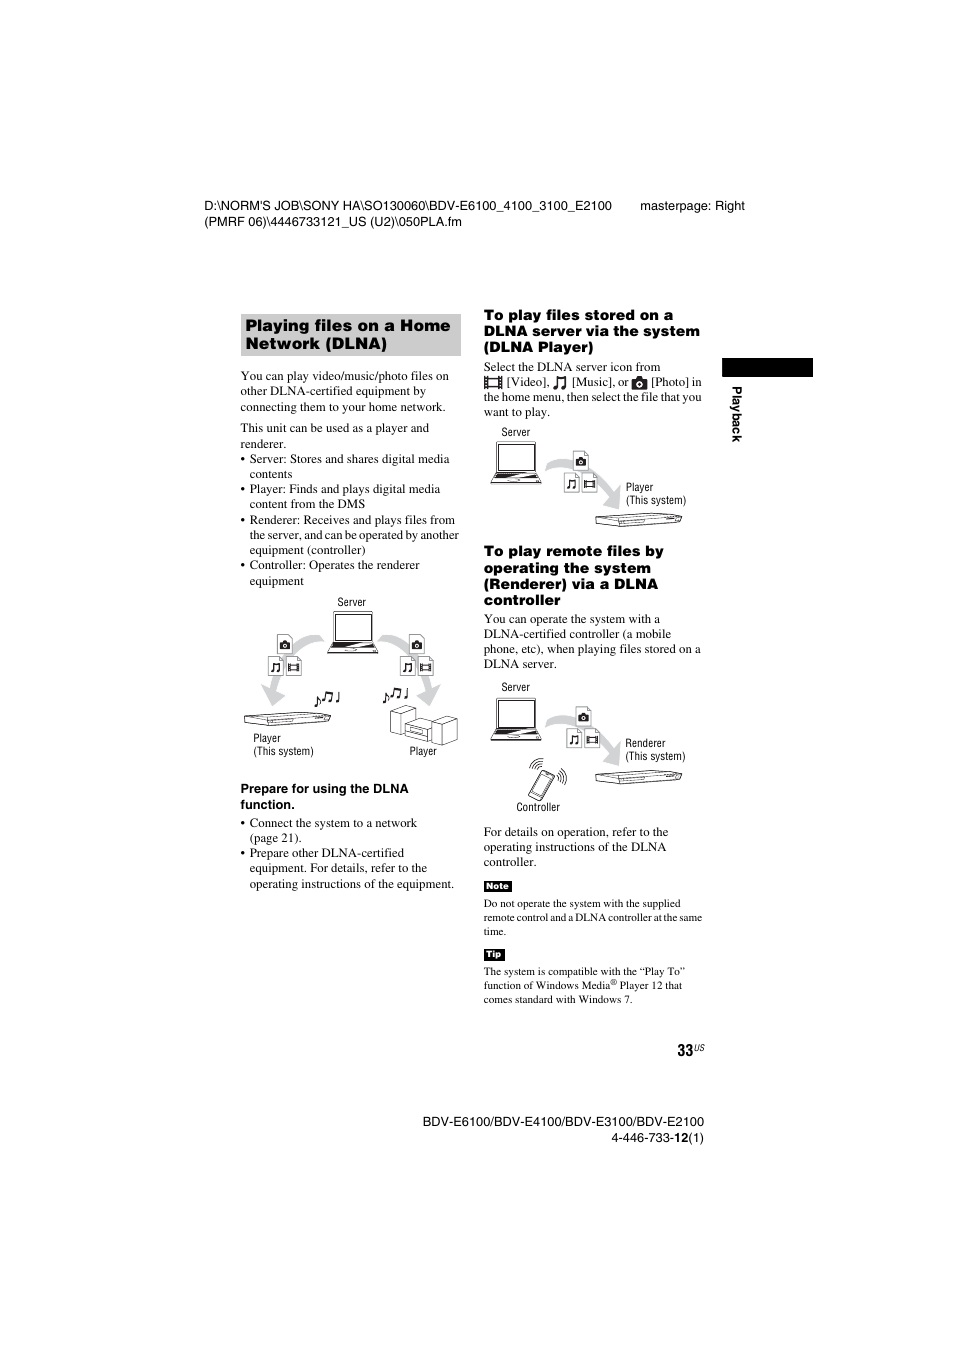 Sony BDV-E2100 User Manual   Page 33 / 72   Also for: BDV-E3100